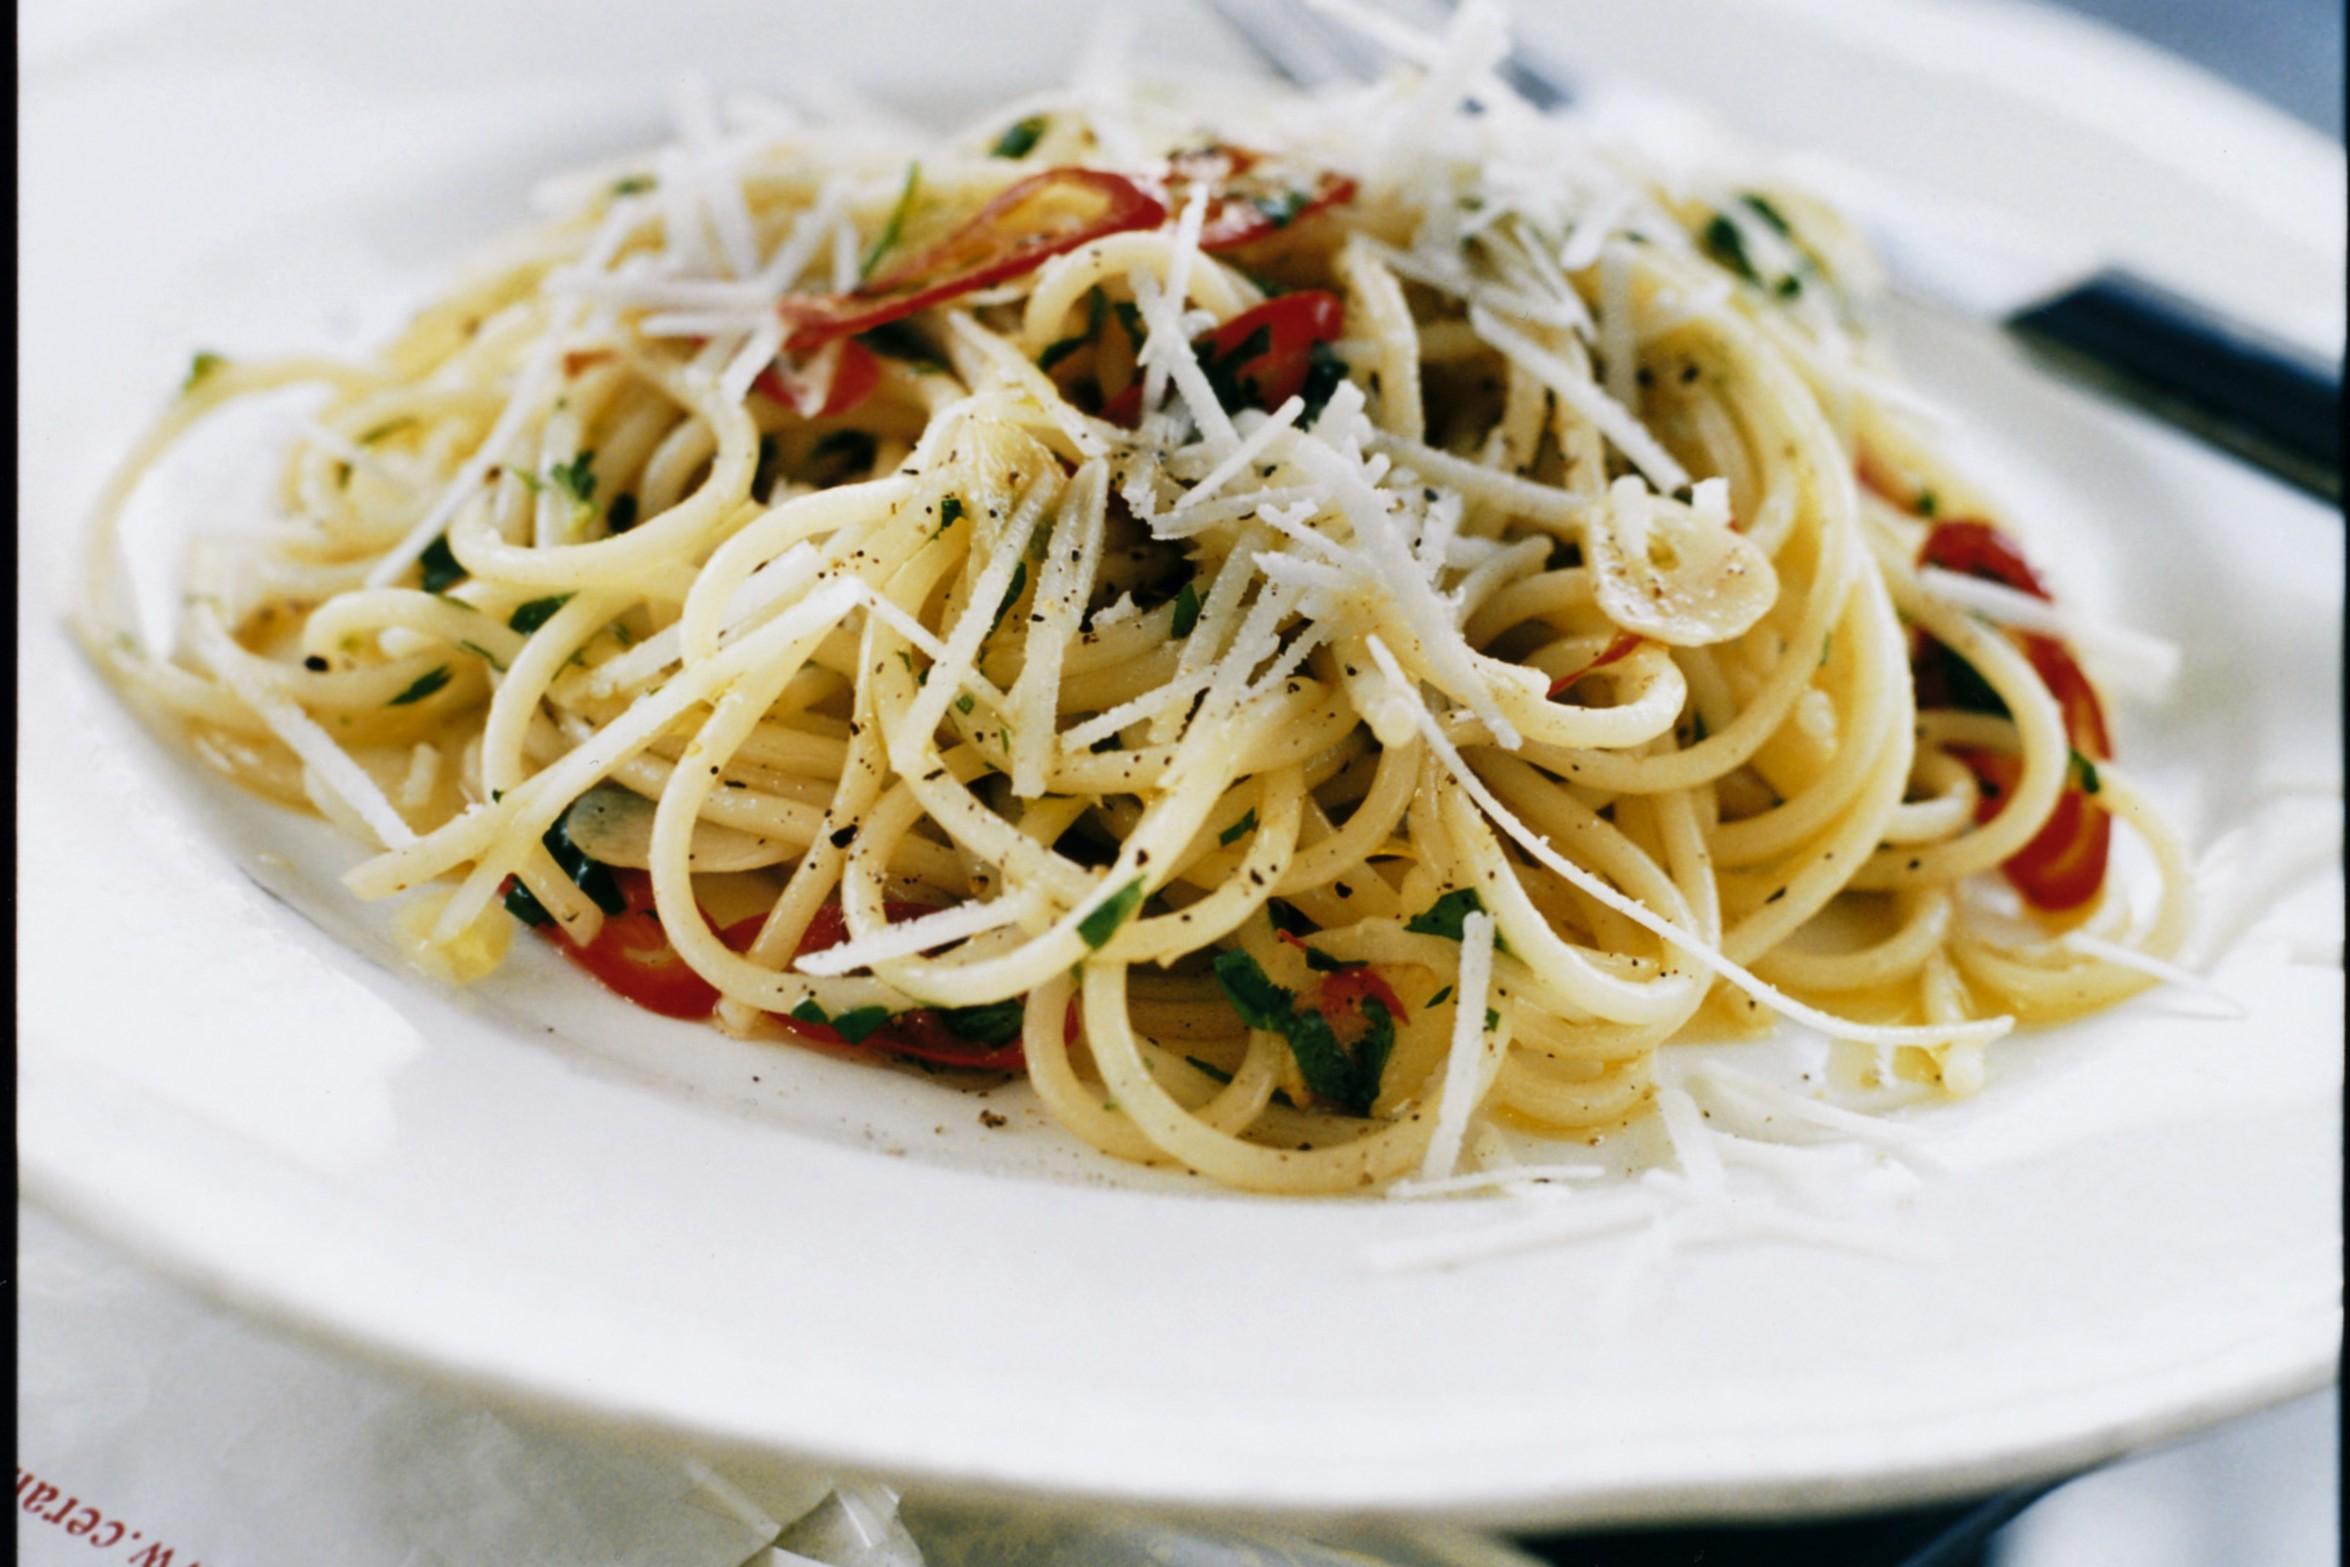 Spaghetti Med Vitlok Chili Och Pecorino Ost Recept Zeta